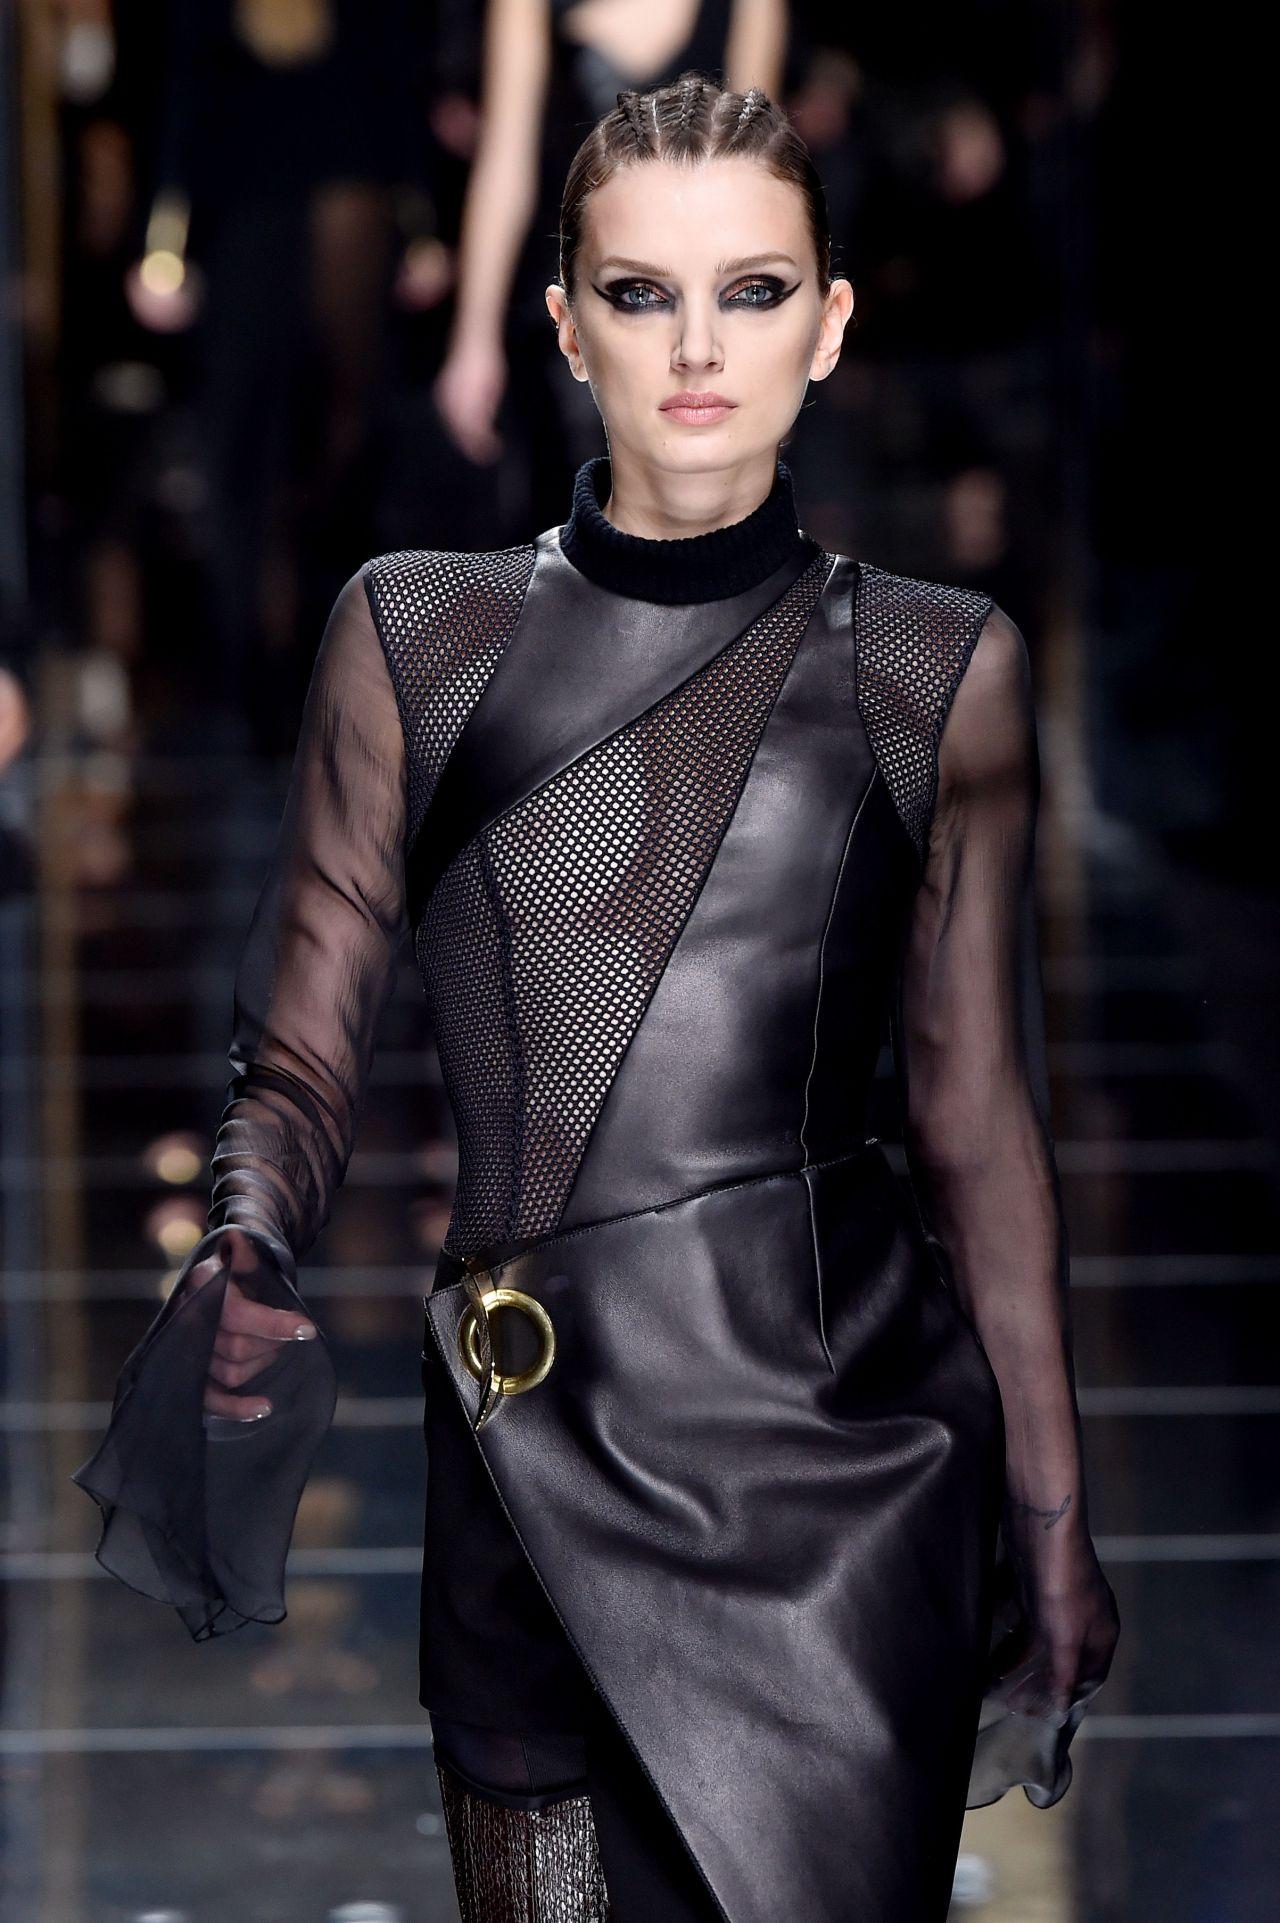 Lily Donaldson Walks Balmain Show Autumn Winter 2017 at Paris Fashion Week 3/2/ 2017